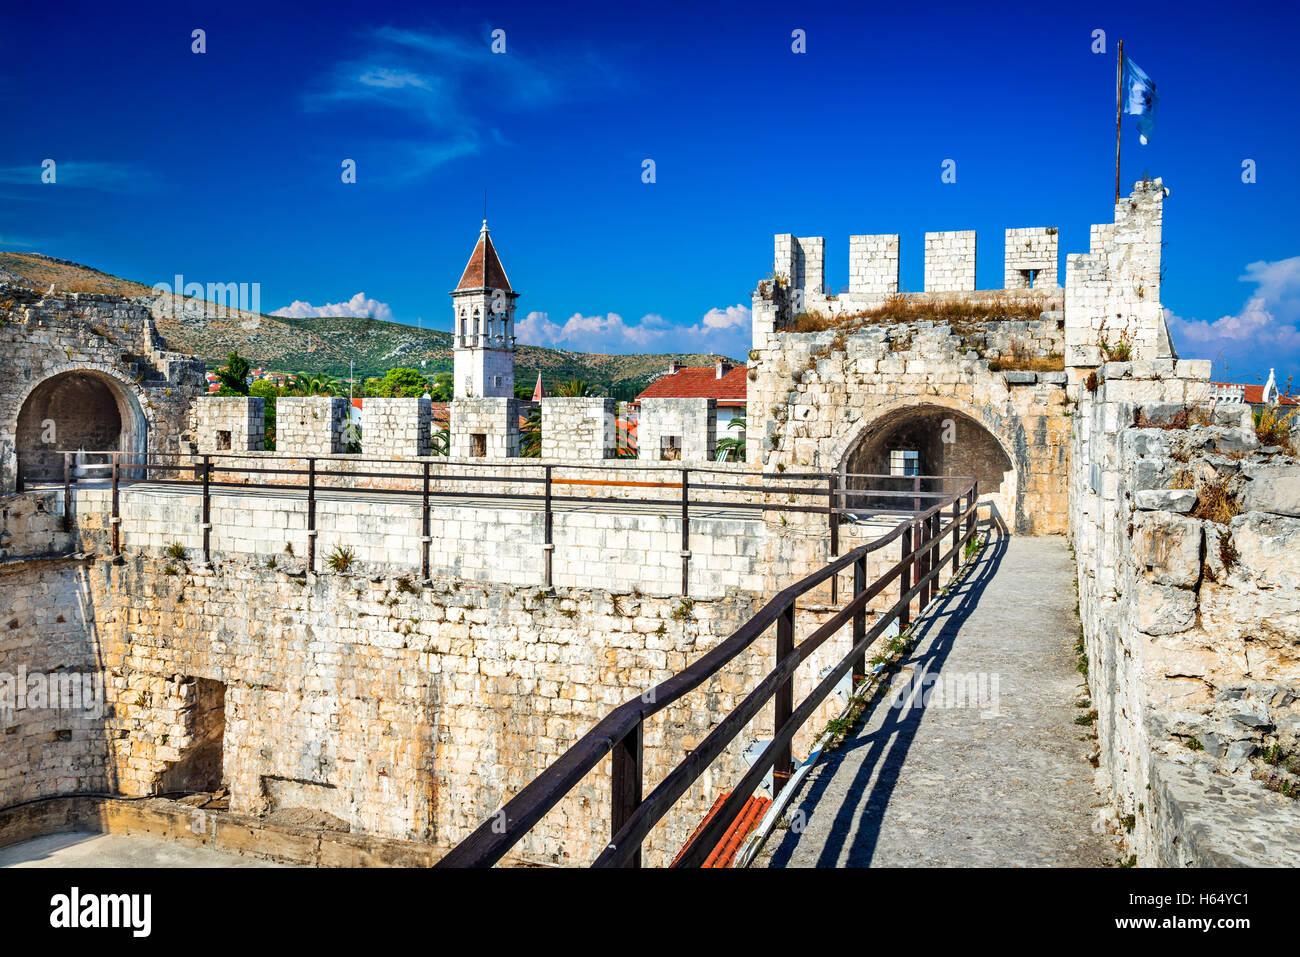 Trogir, Croatia. Old medieval fortress of Trogir on Dalmatian Island, Split city region. Stock Photo